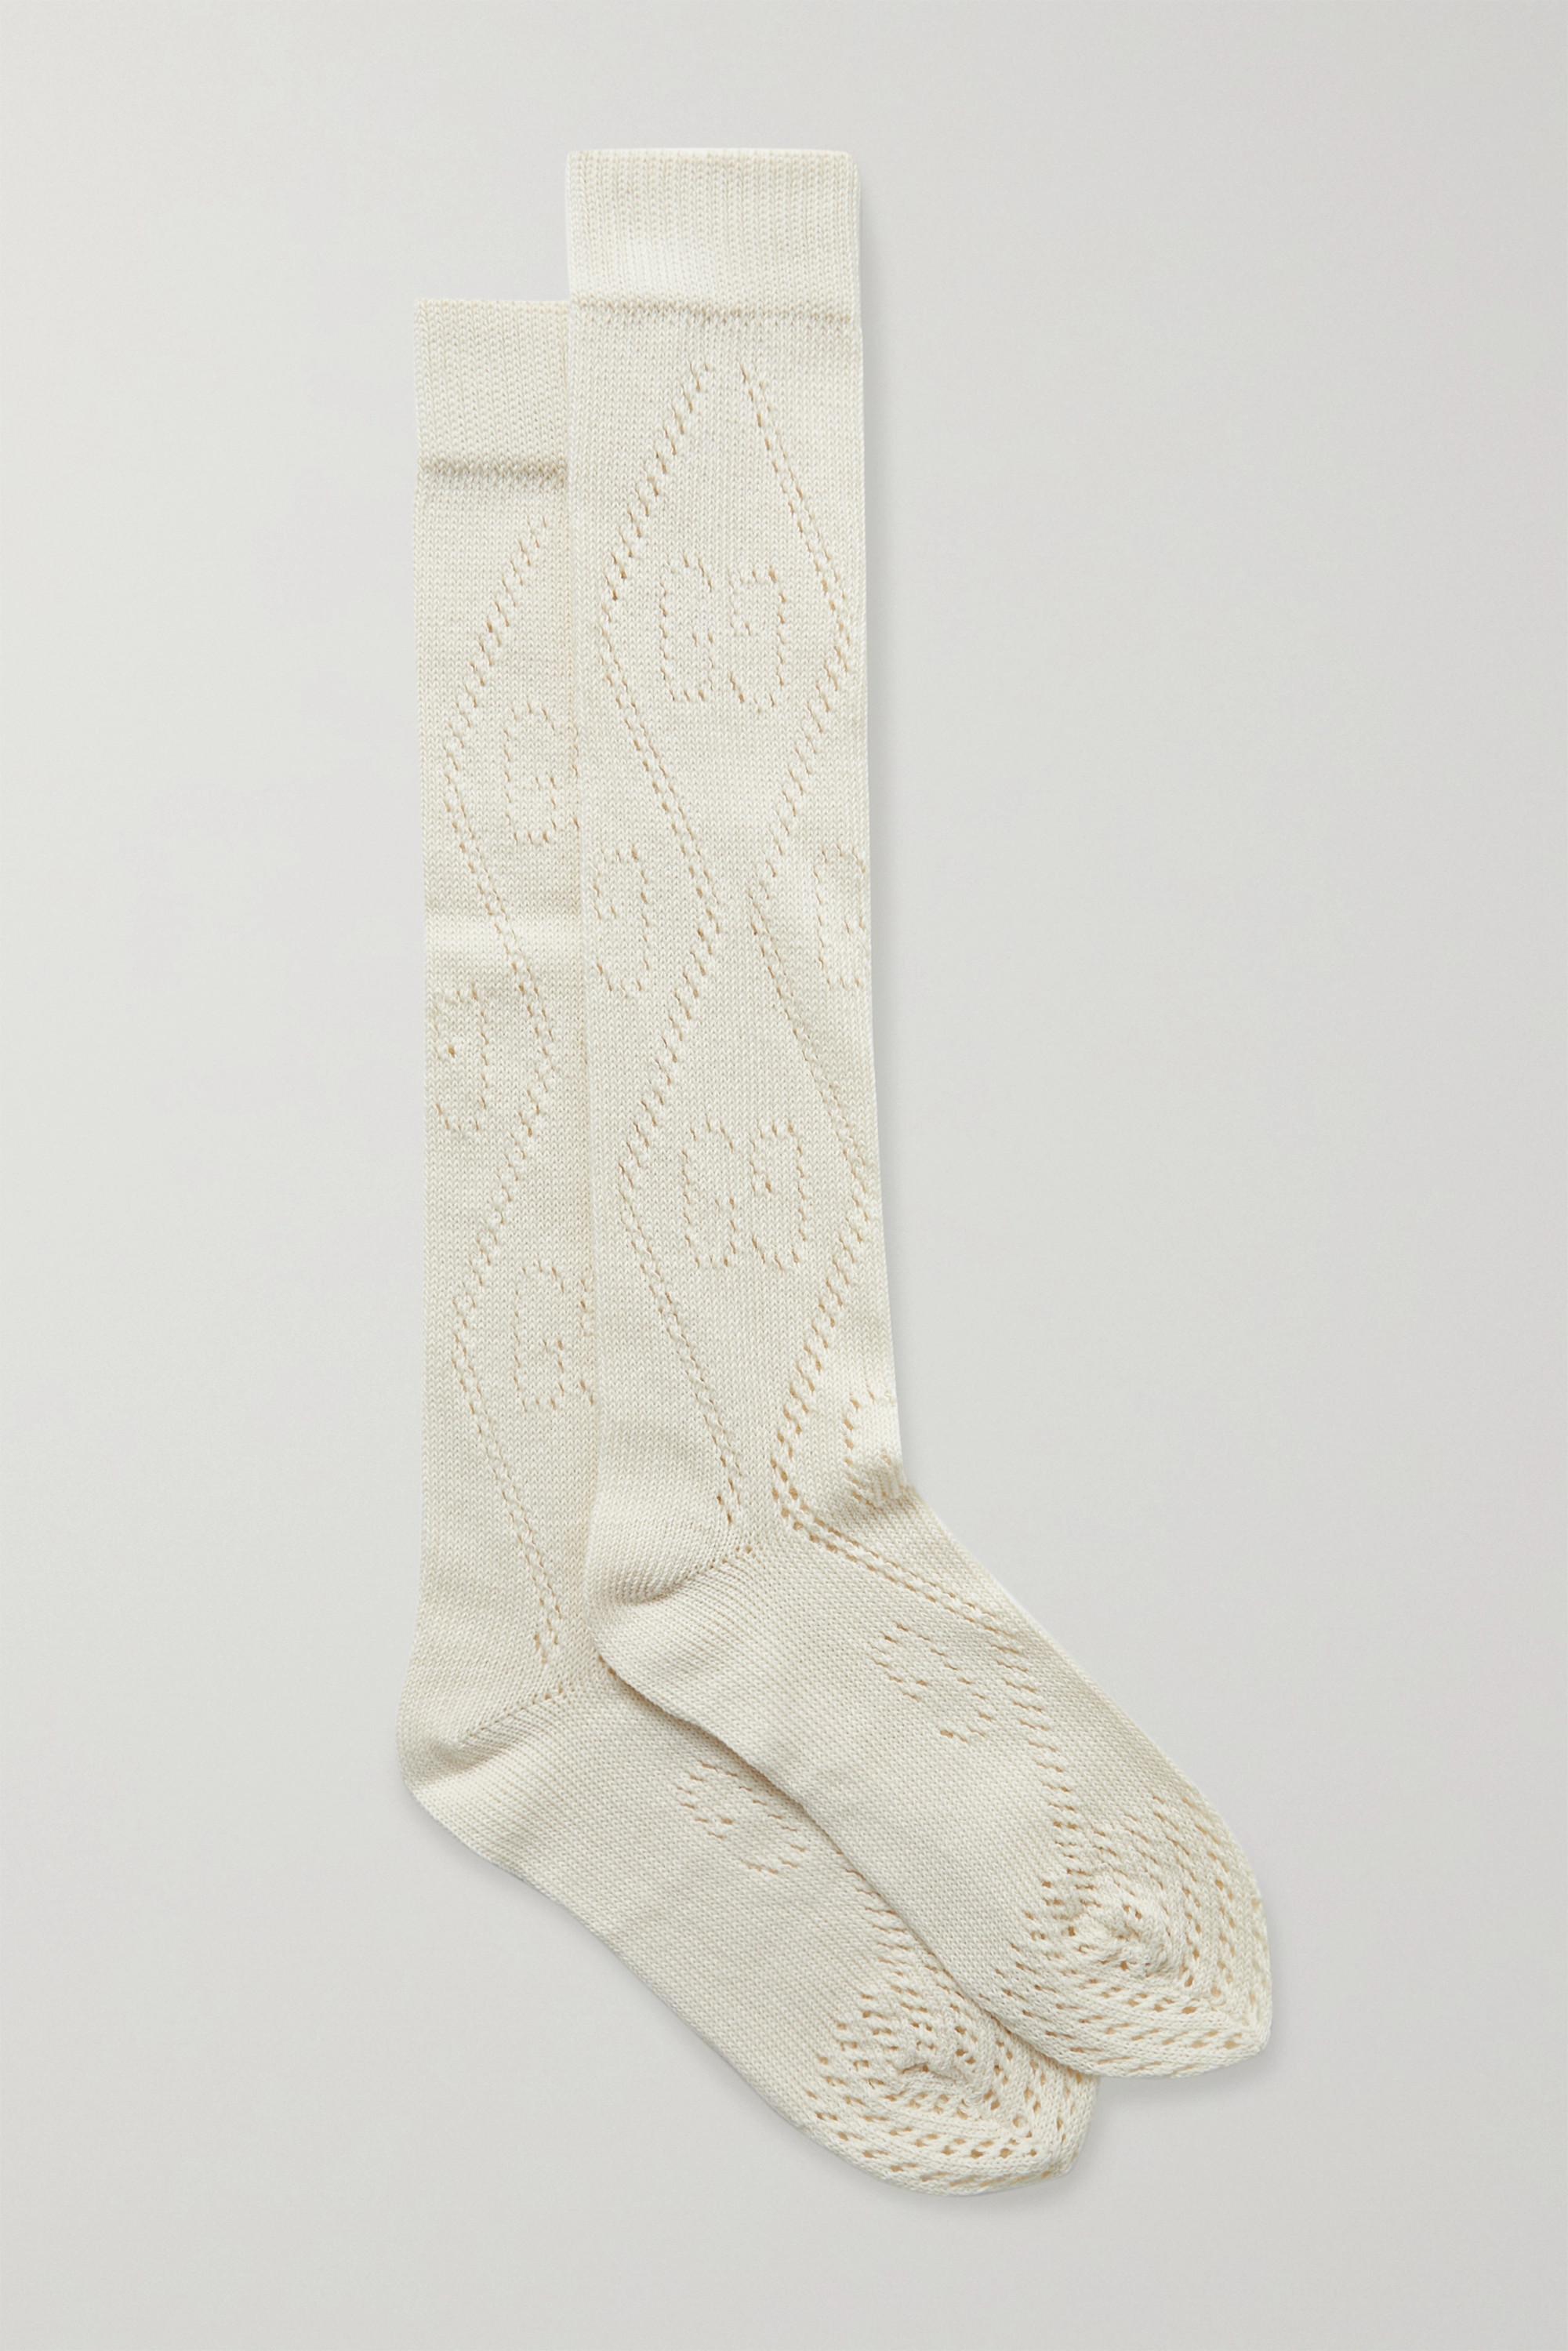 Gucci Pointelle-knit cotton-blend socks